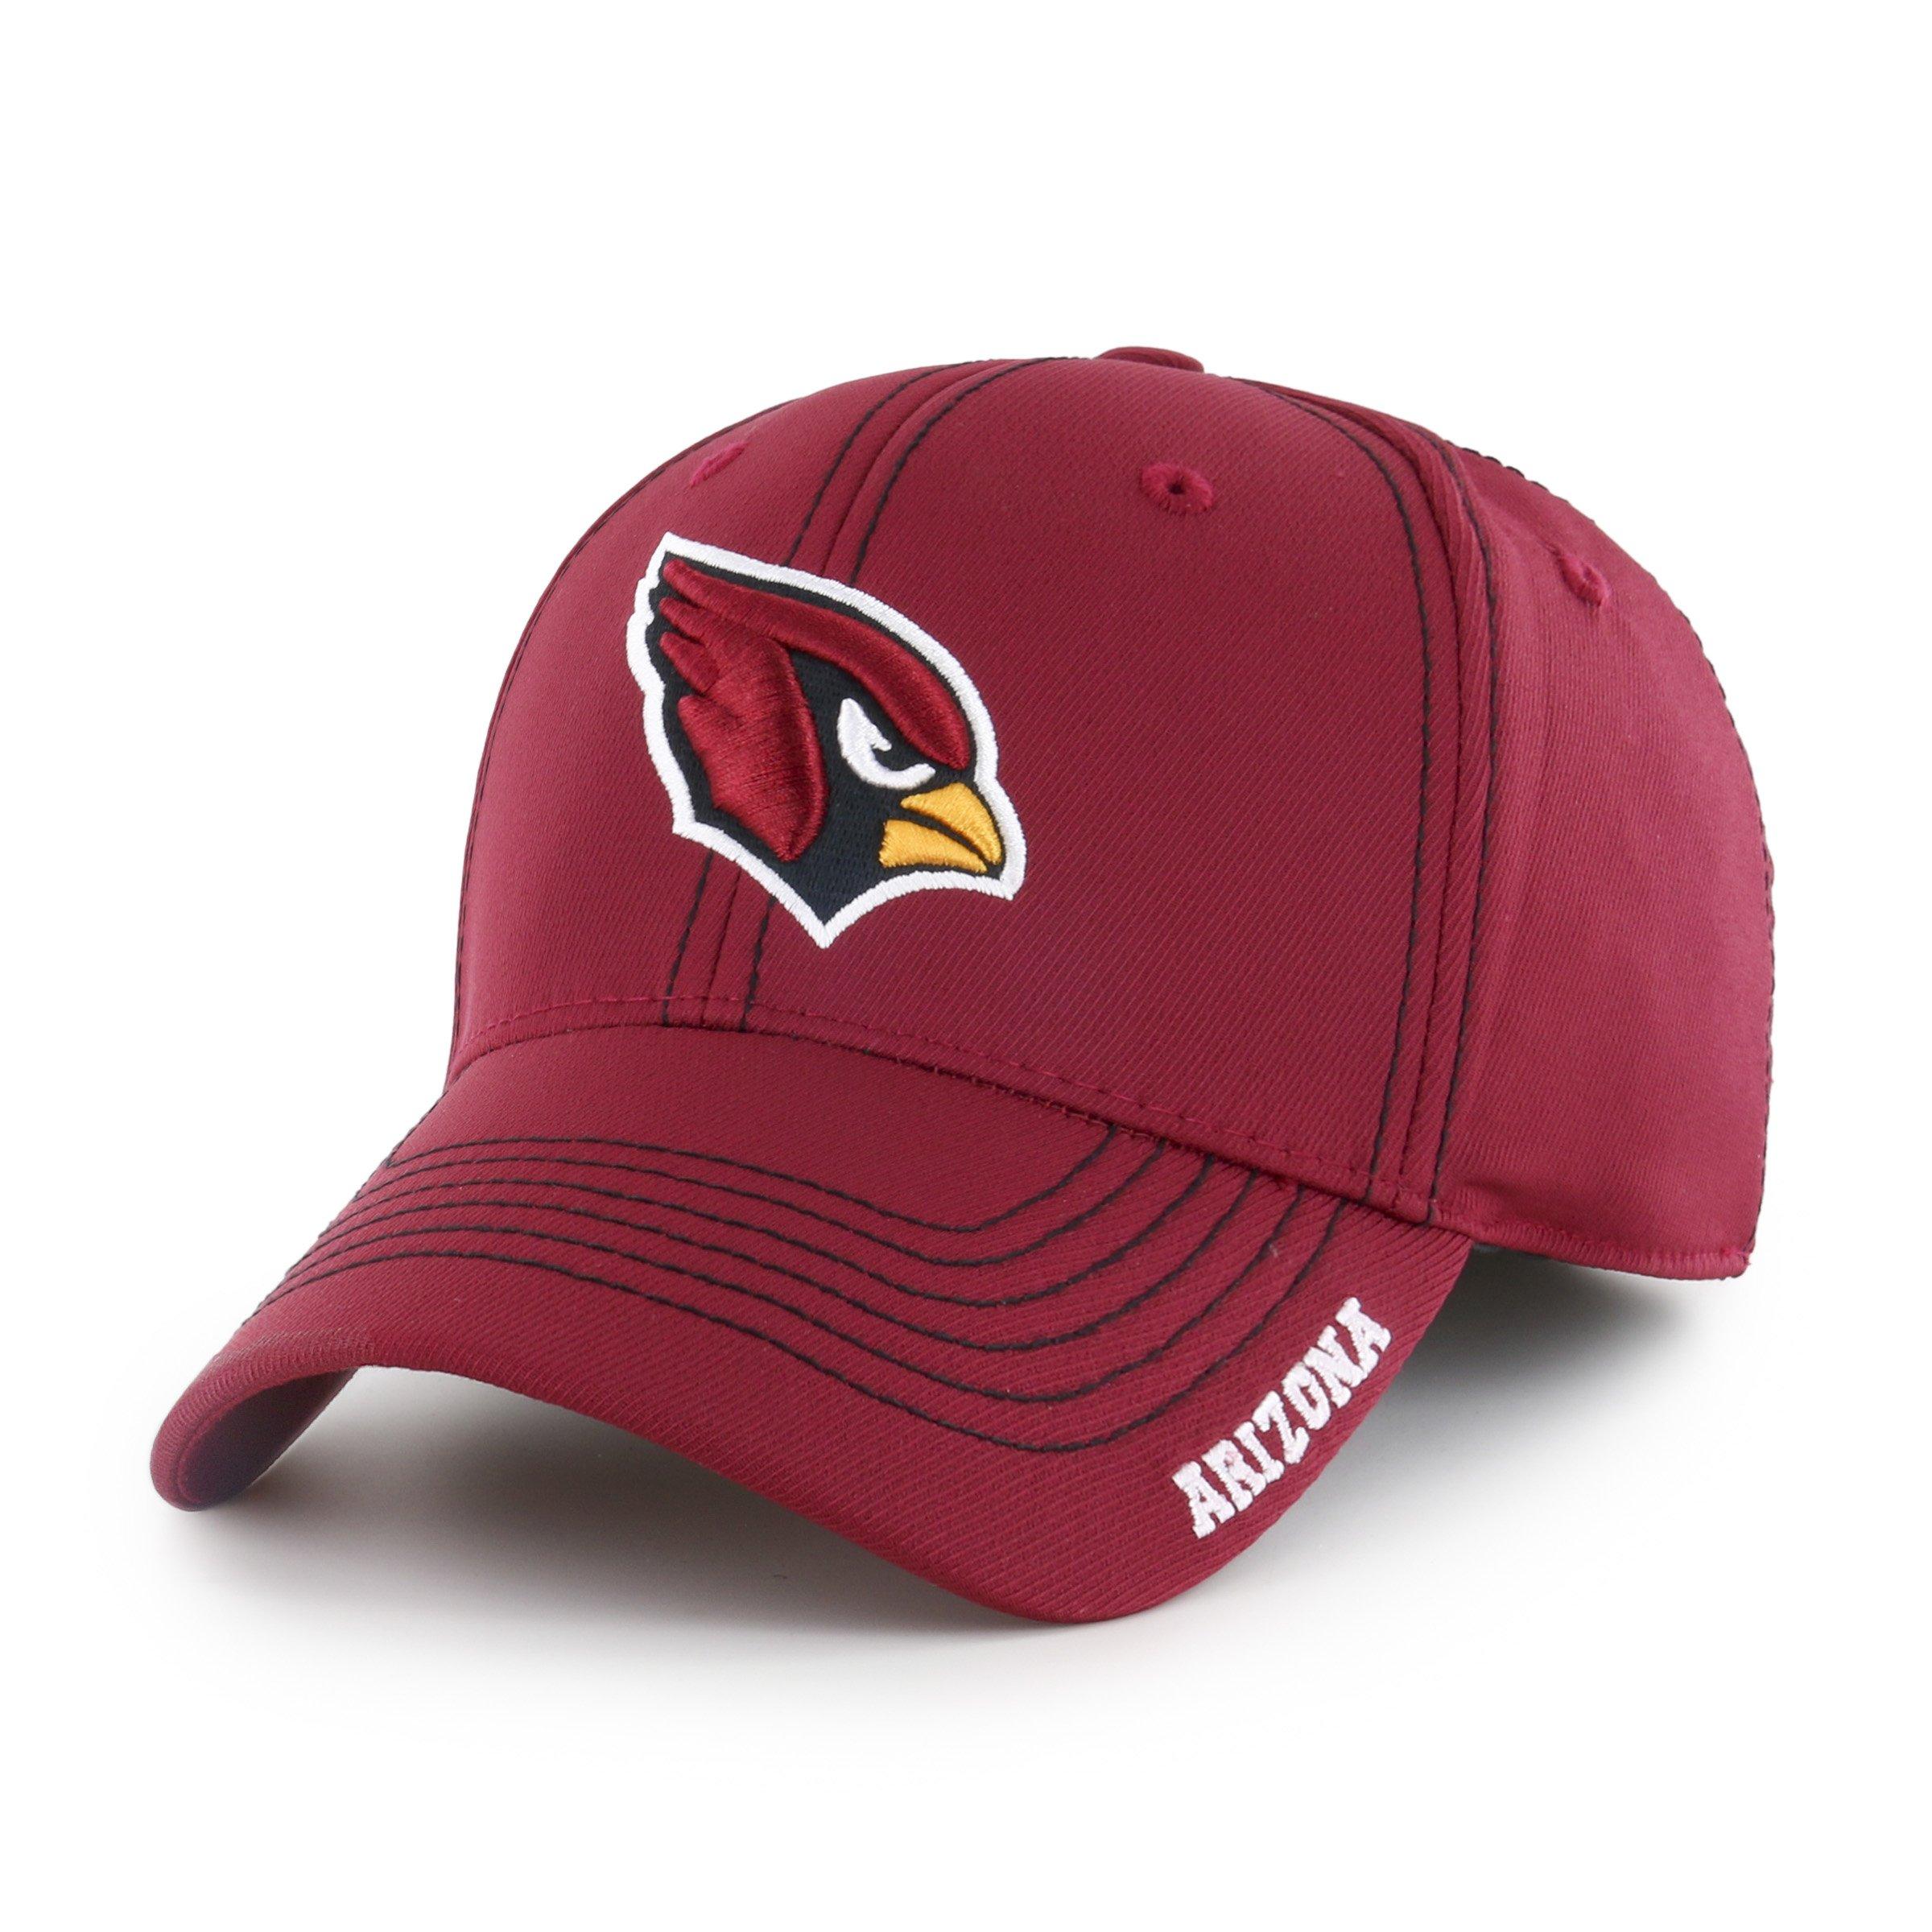 NFL Men's OTS Start Line Center Stretch Fit Hat 1